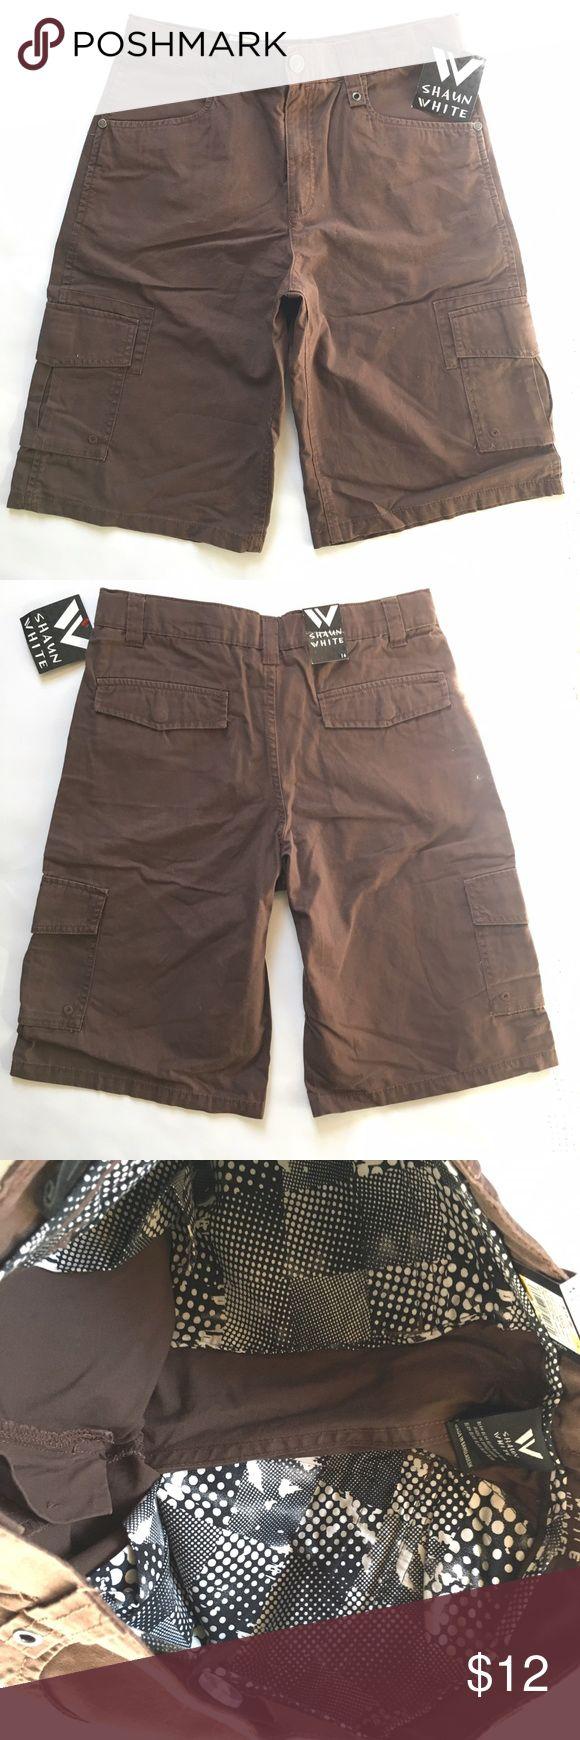 "Shaun White Men's Brown Shorts Size 14 NWT Shaun White Men's Knickers Brown Shorts Size 14 NWT. Inseam: 11.25"" Outseam: 21.25 Color: Knickers Brown Shorts Cargo"